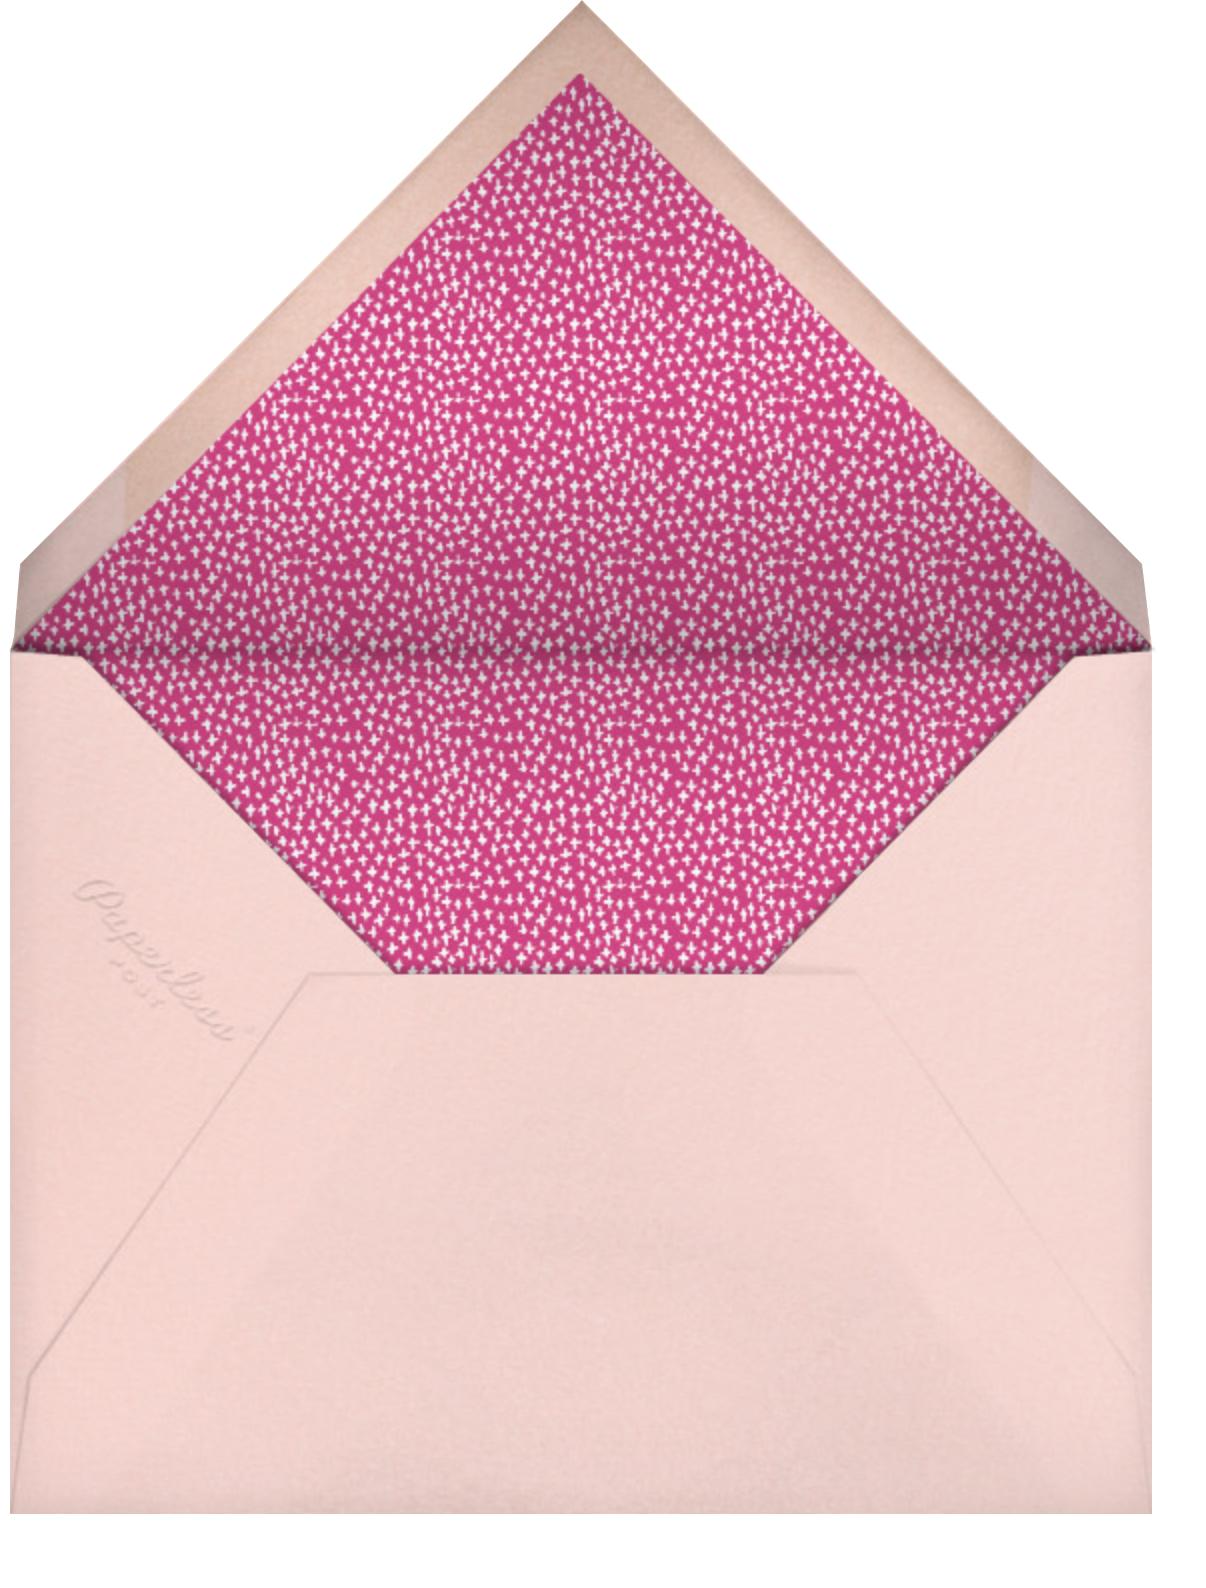 Party's Going Swimmingly - Fair - Mr. Boddington's Studio - Adult birthday - envelope back